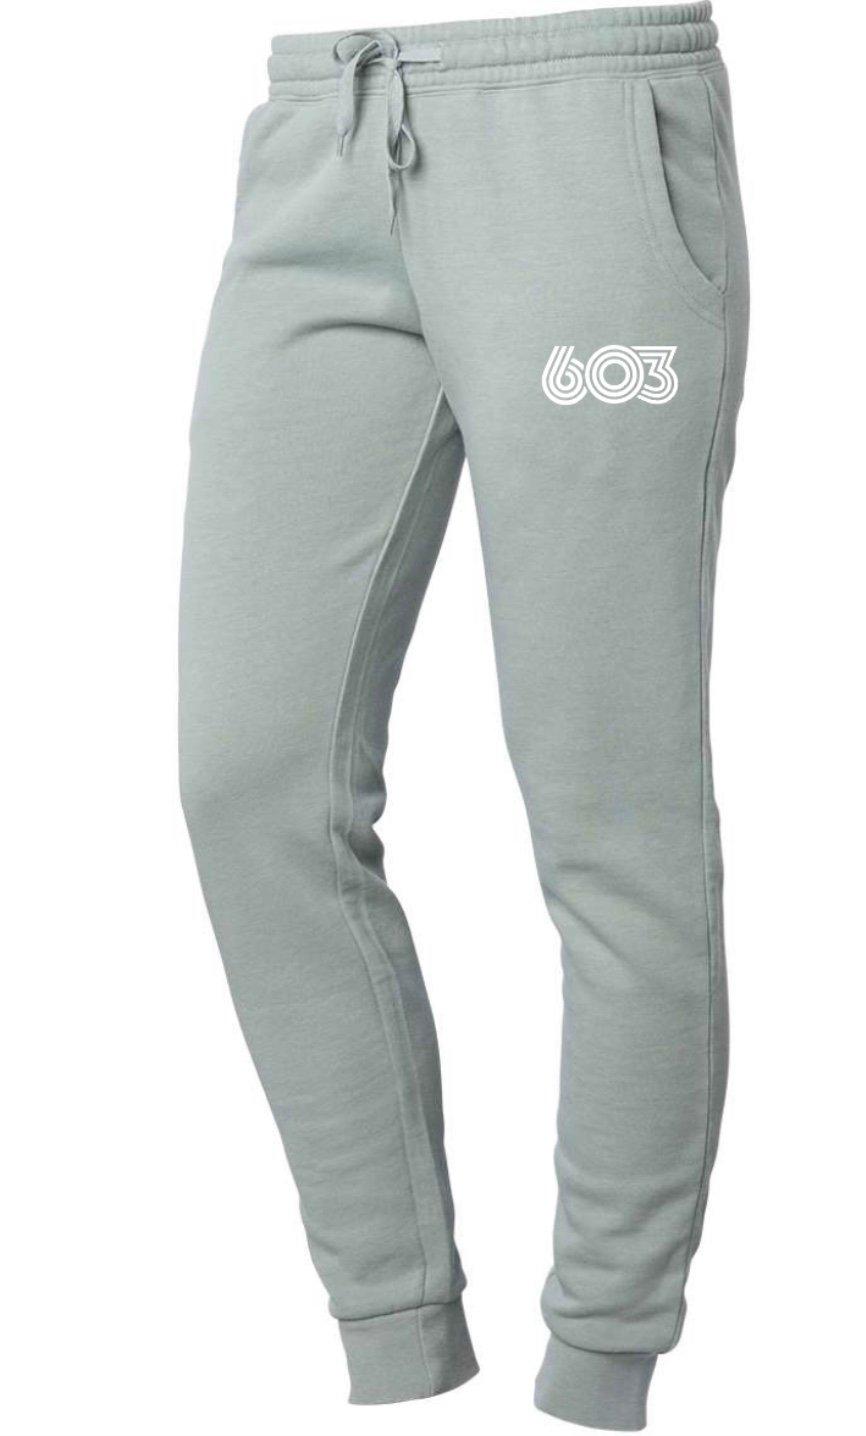 Image of Sage women's Retro 603 sweatpants